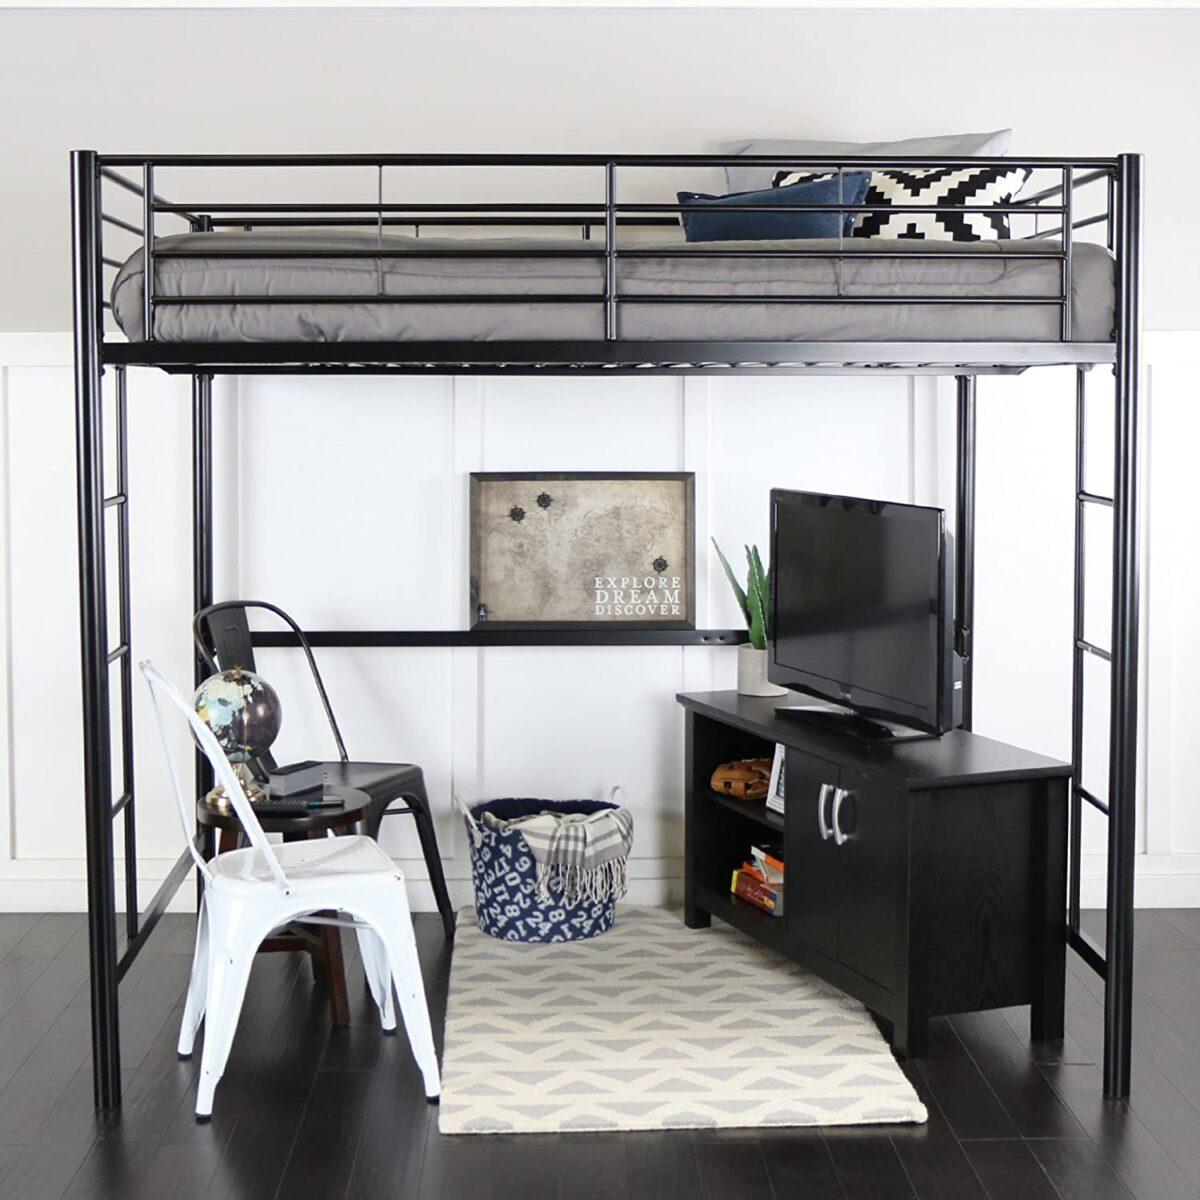 furnish-bedroom-4 × 4-5